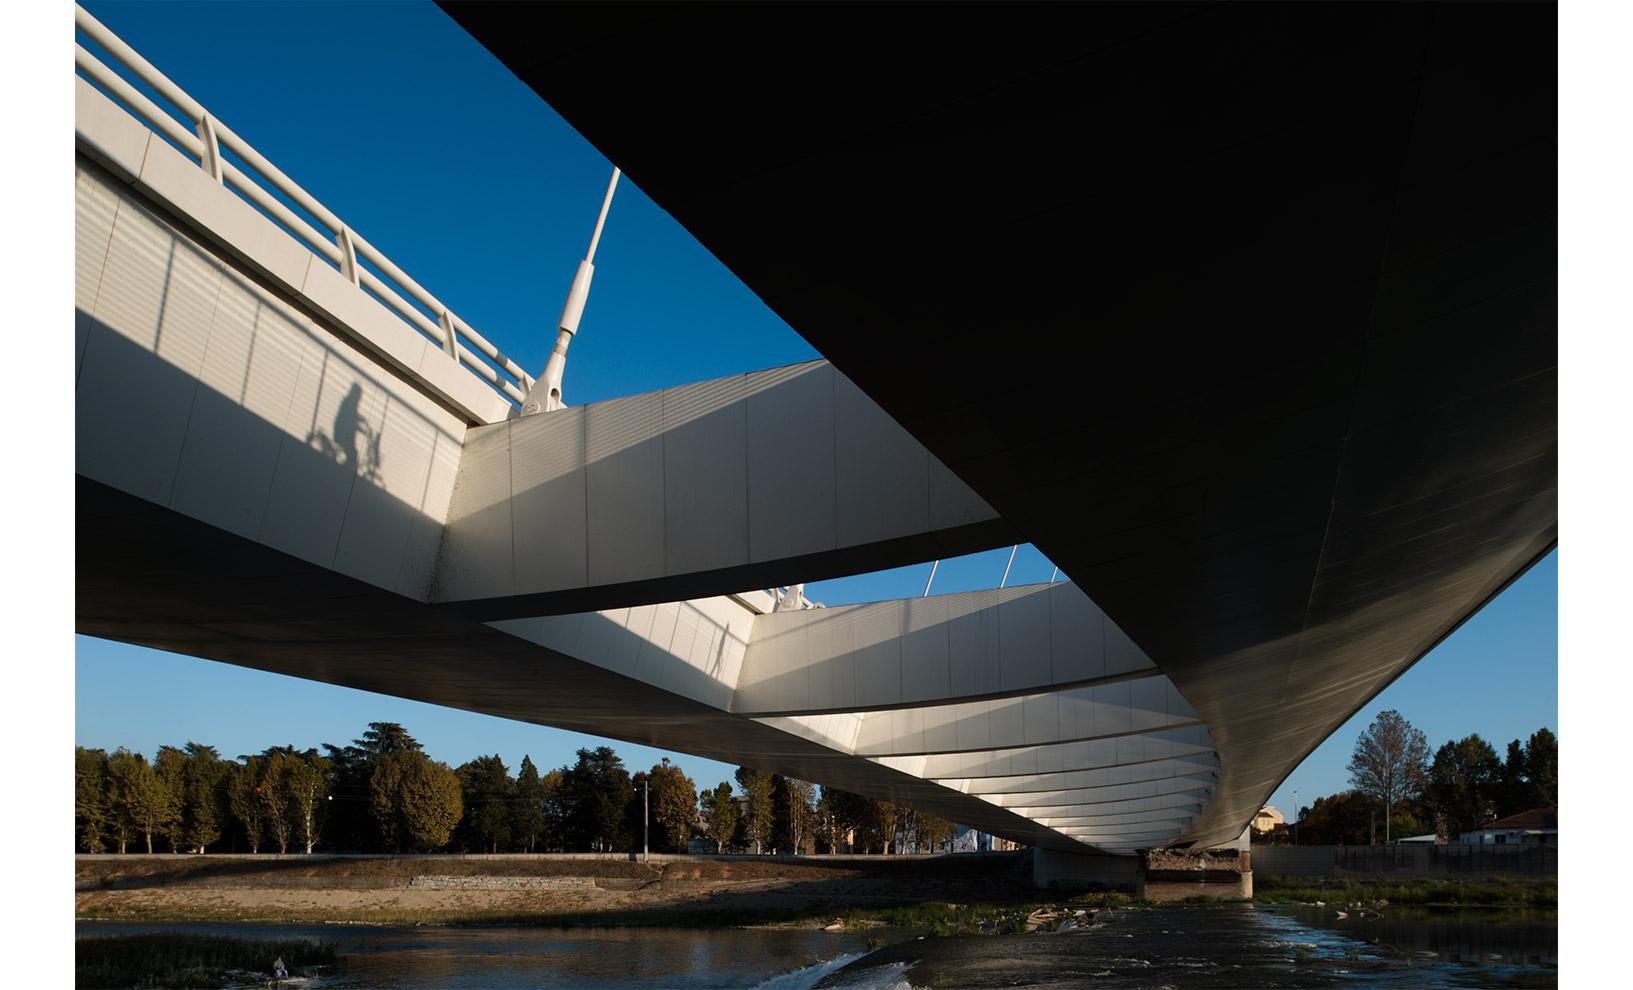 ©marco-tacchini-fotografo-ponte-cittadella-richar-meier-and-partners_06